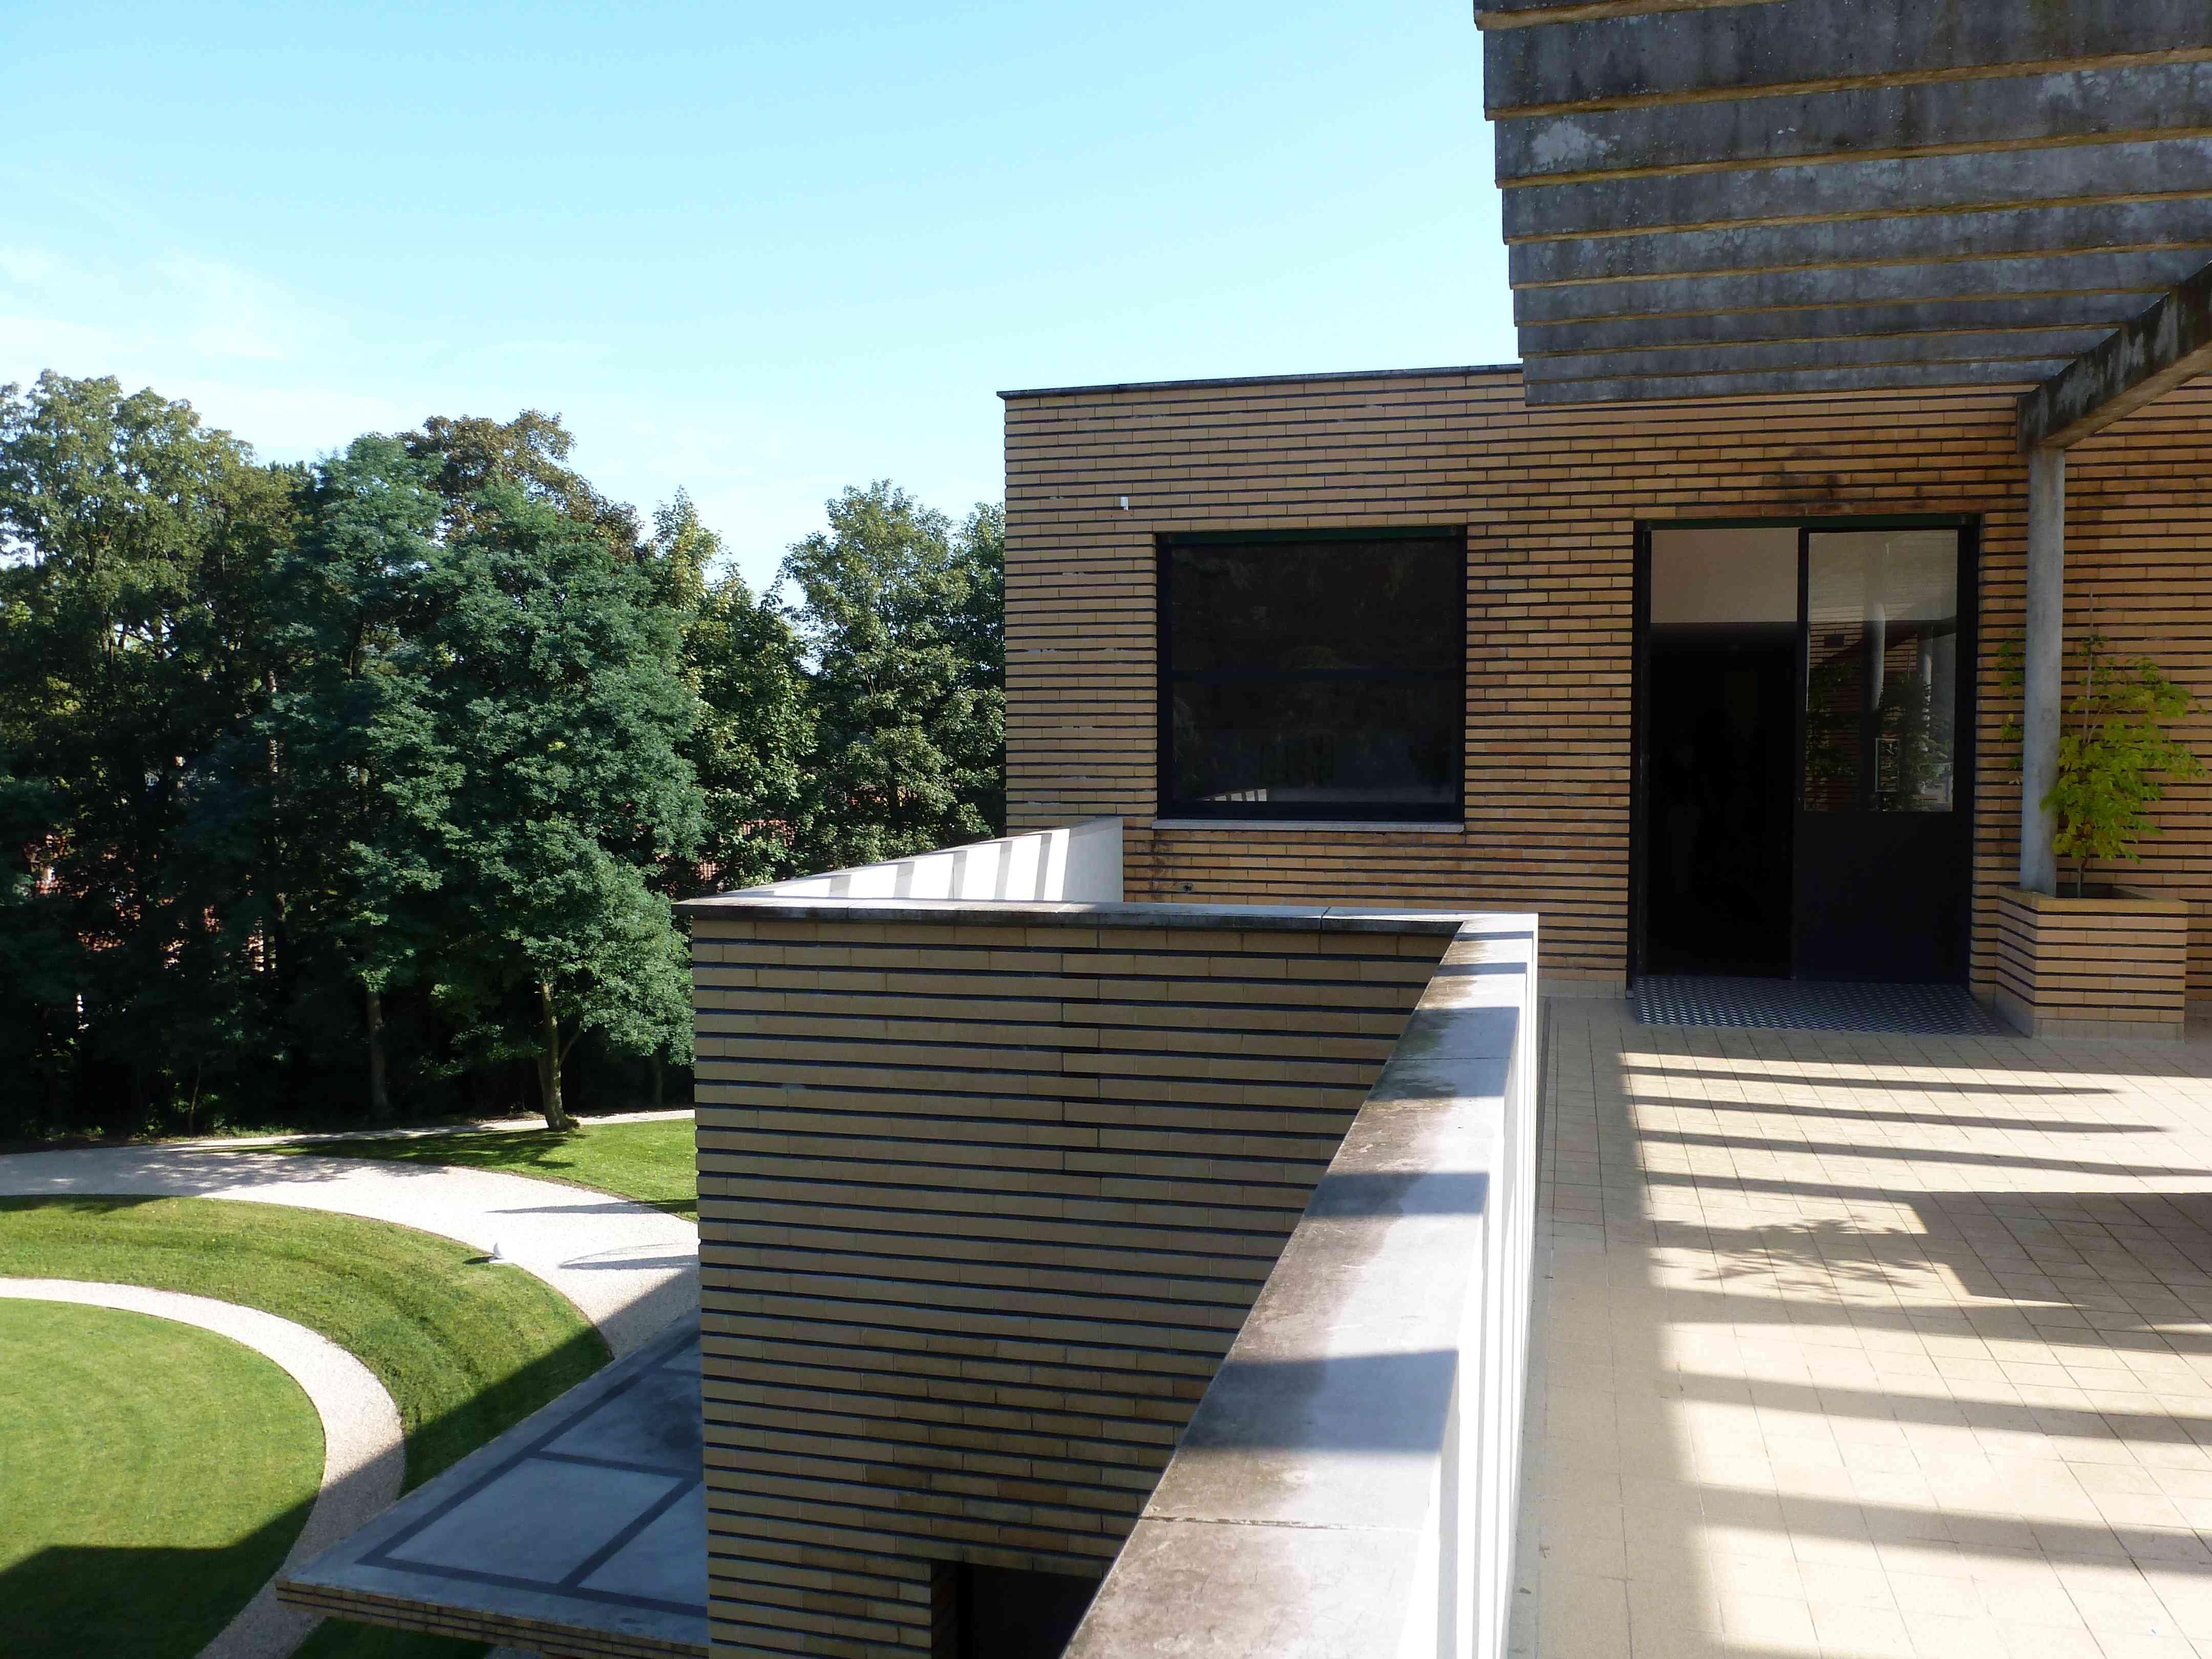 Villa Cavrois Croix 09-2013 terrasse jardin 1932